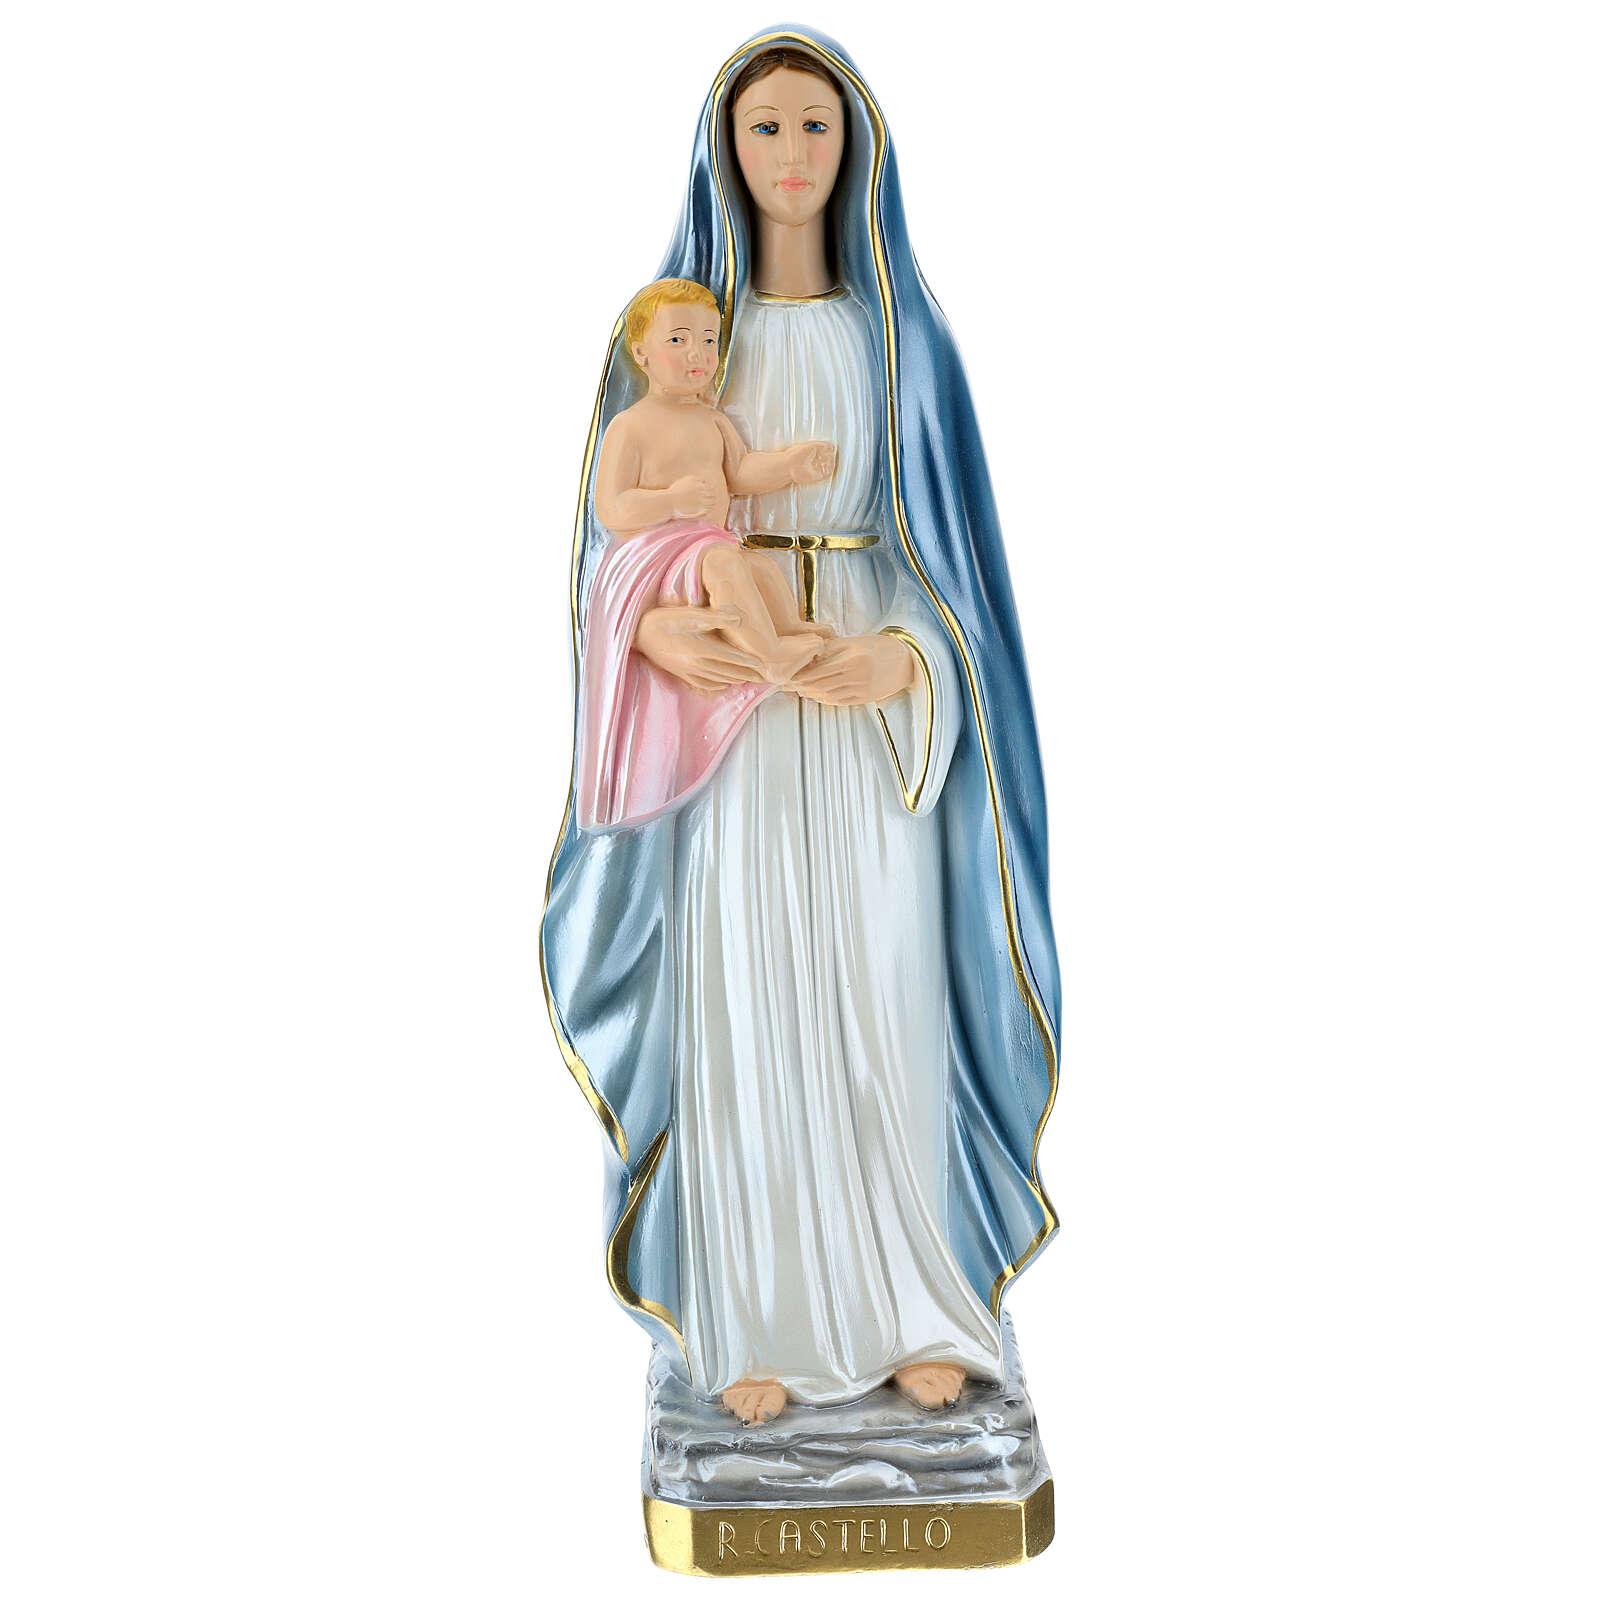 Statue Virgin Queen of the Castle mother of pearl plaster 60 cm 4